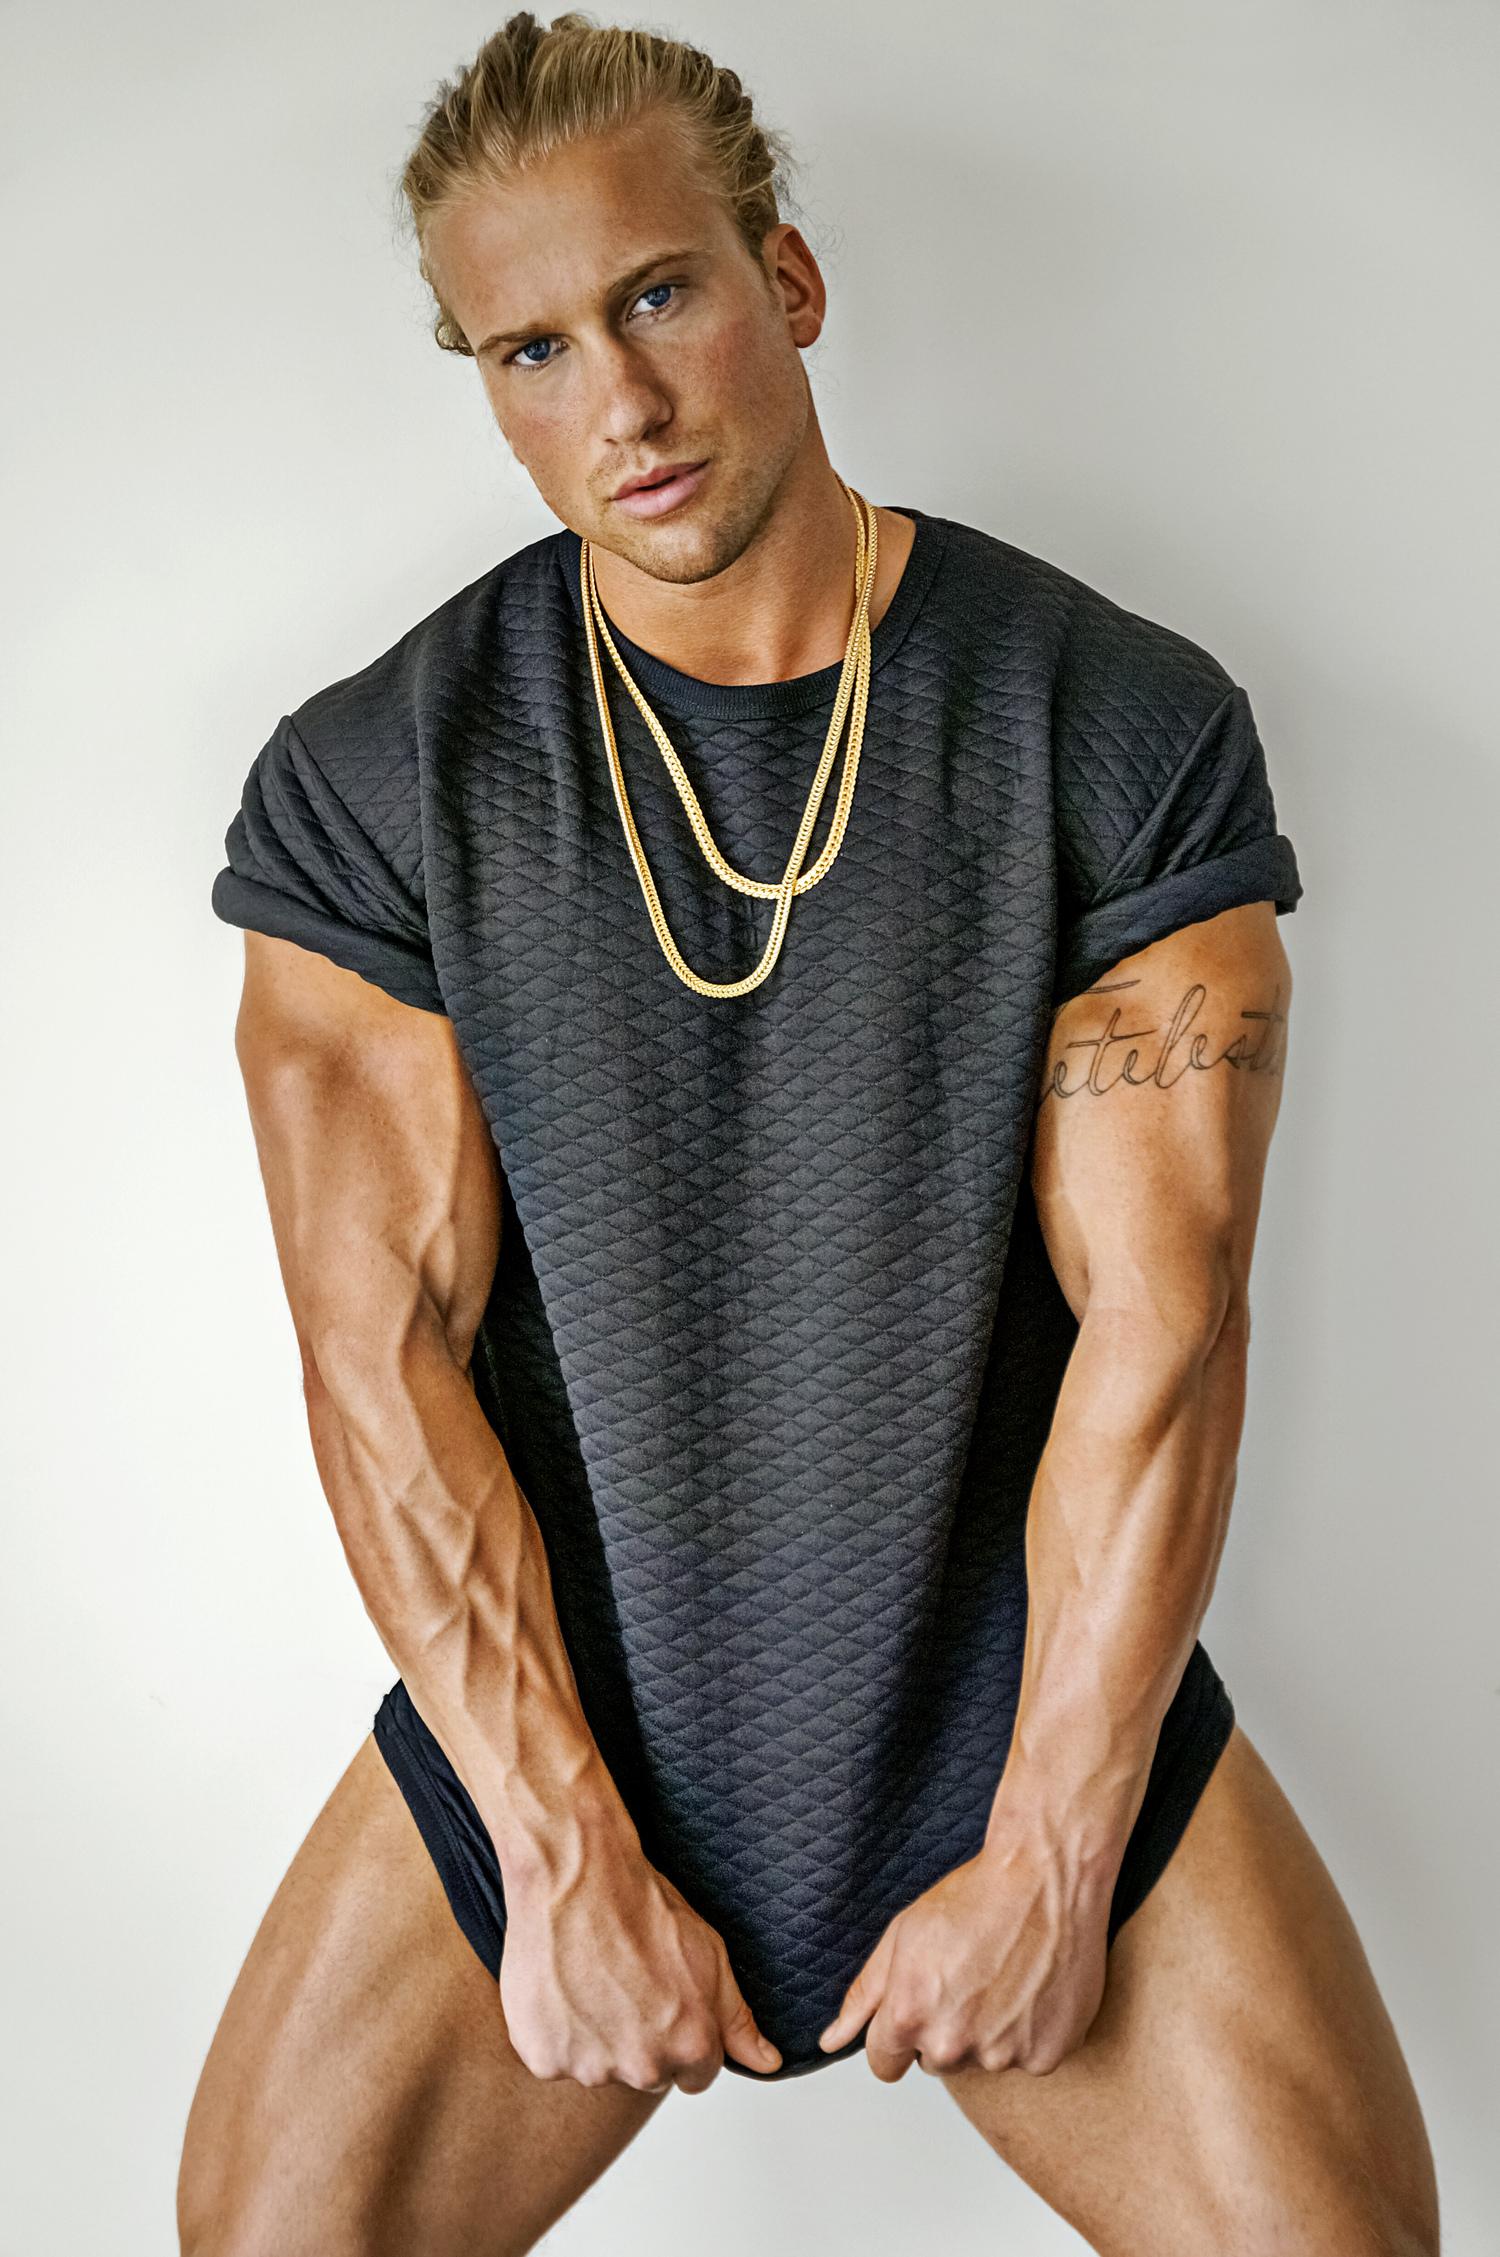 Adon Exclusive: Model Eric TenBrink By Mattheus Lian